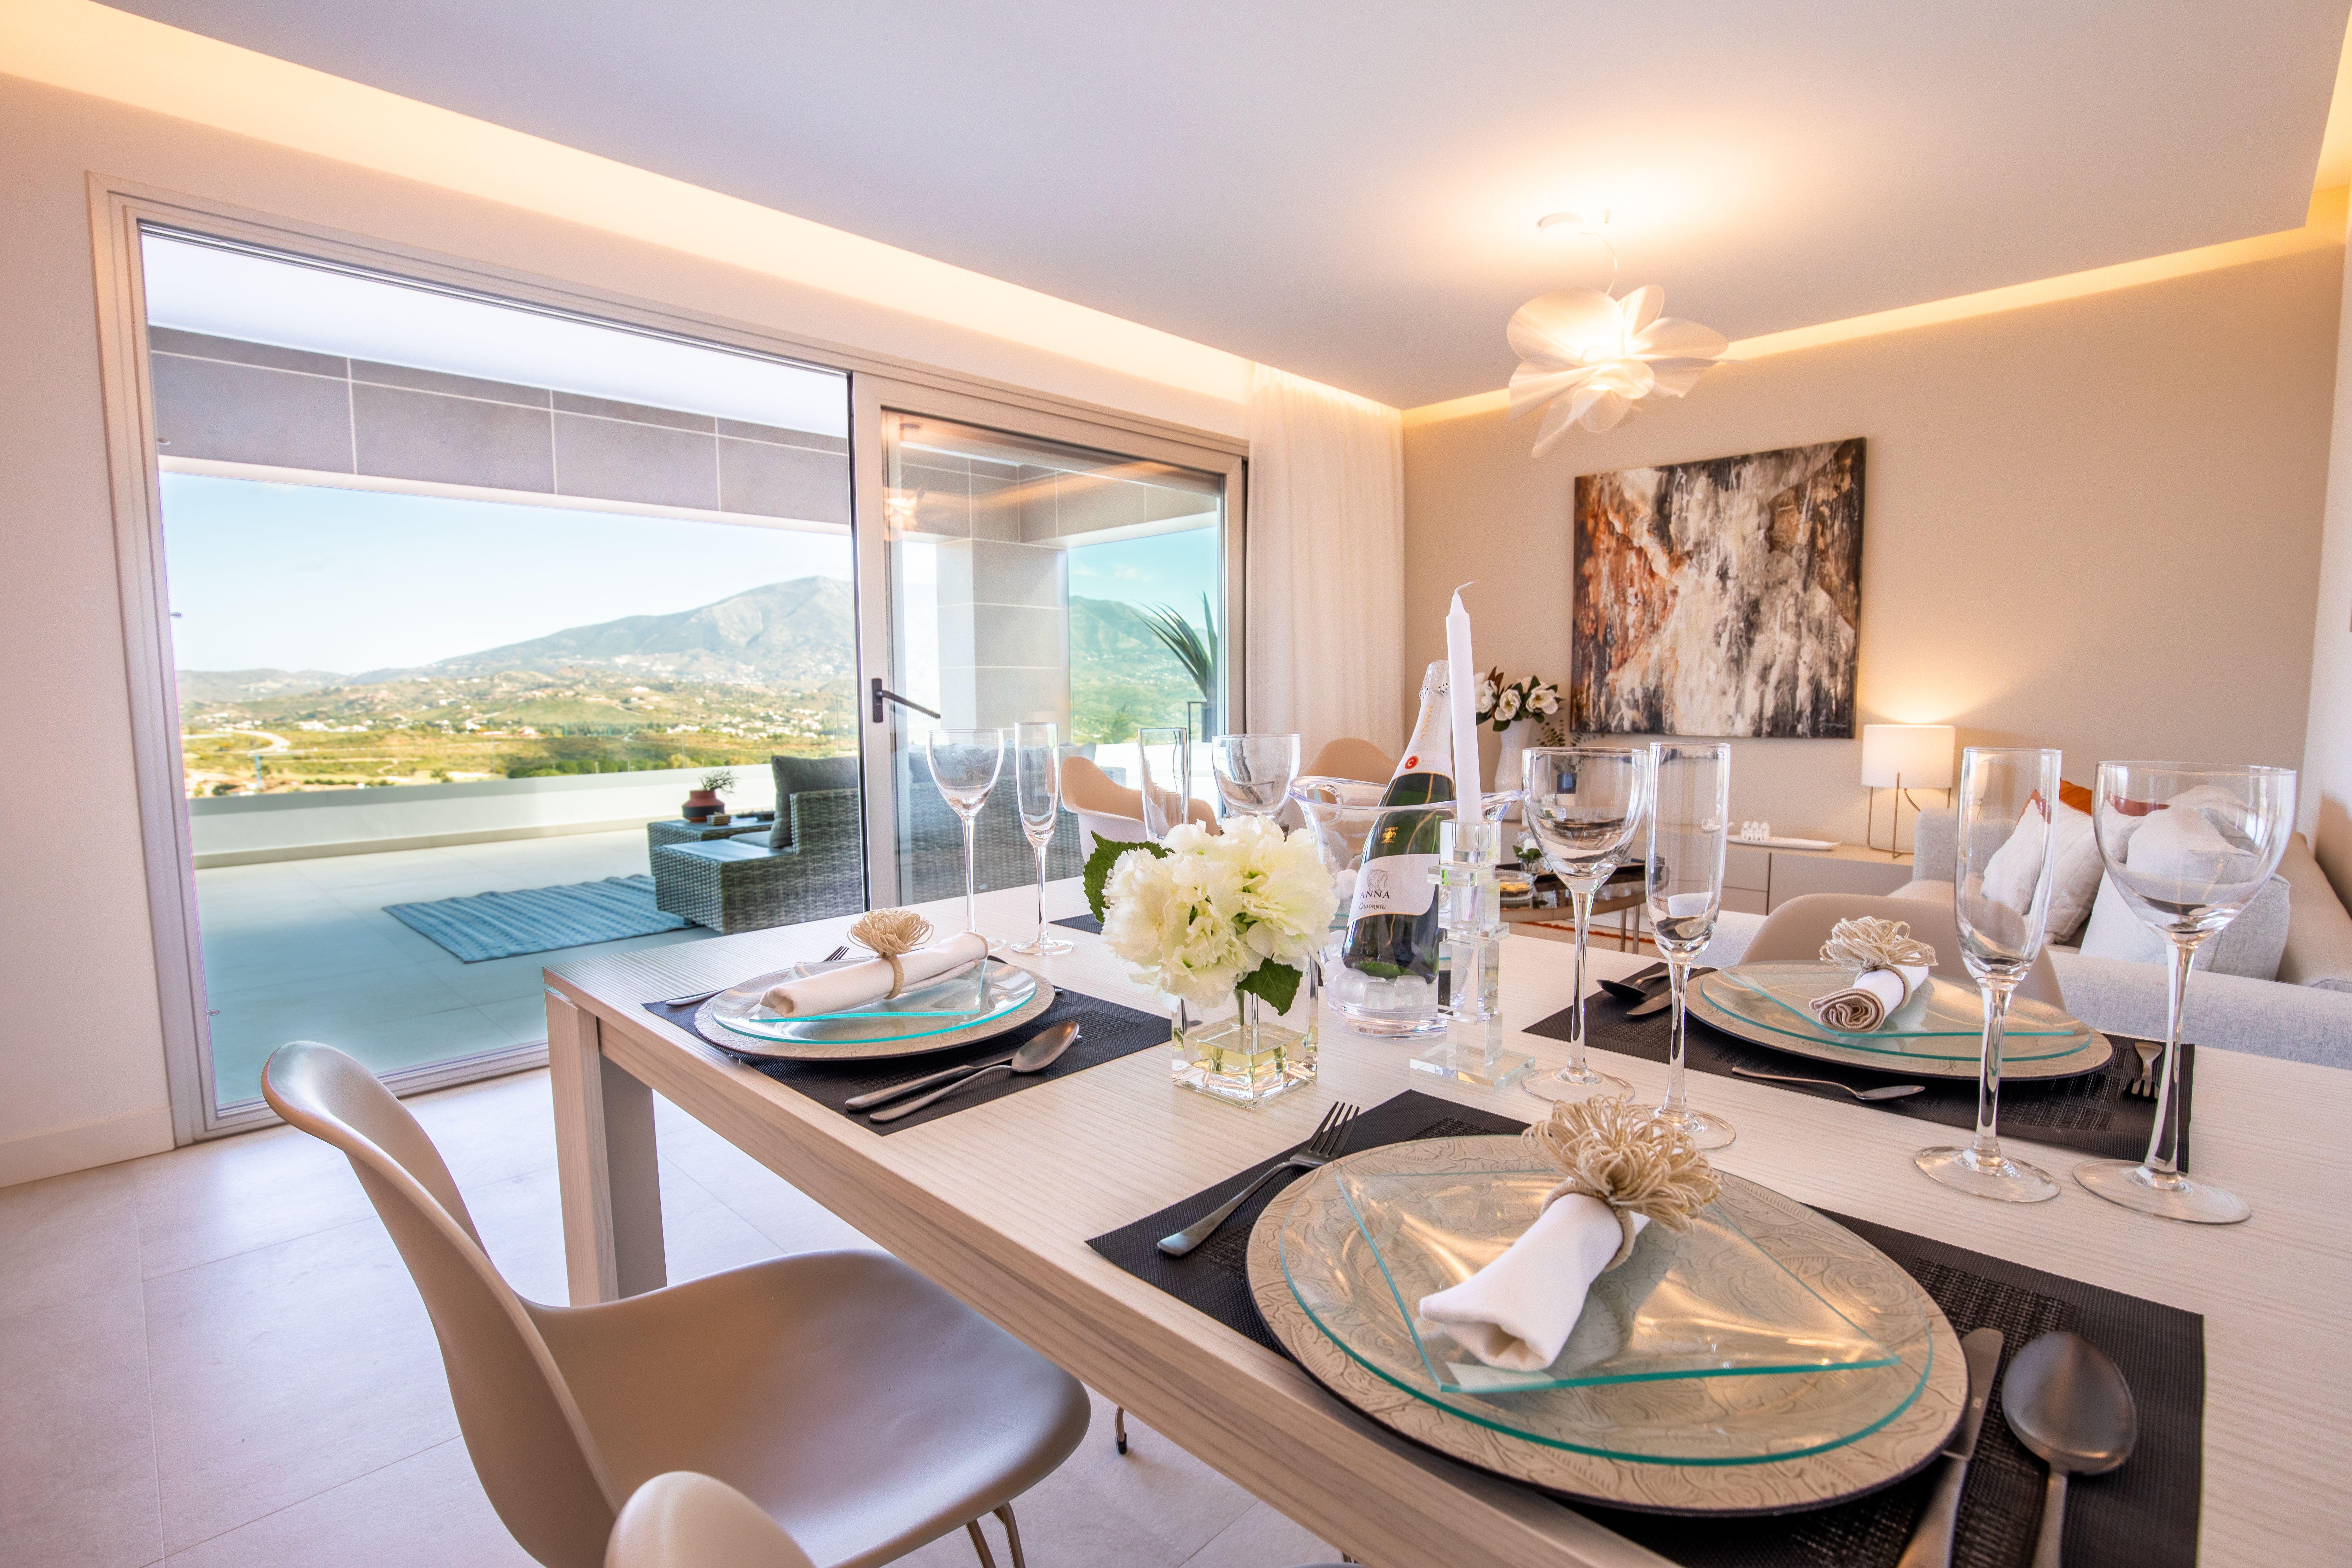 Grand View La Cala Golf Resort Mijas Malaga Taylor Wimpey Penthouse For Sale Golf Resort Home